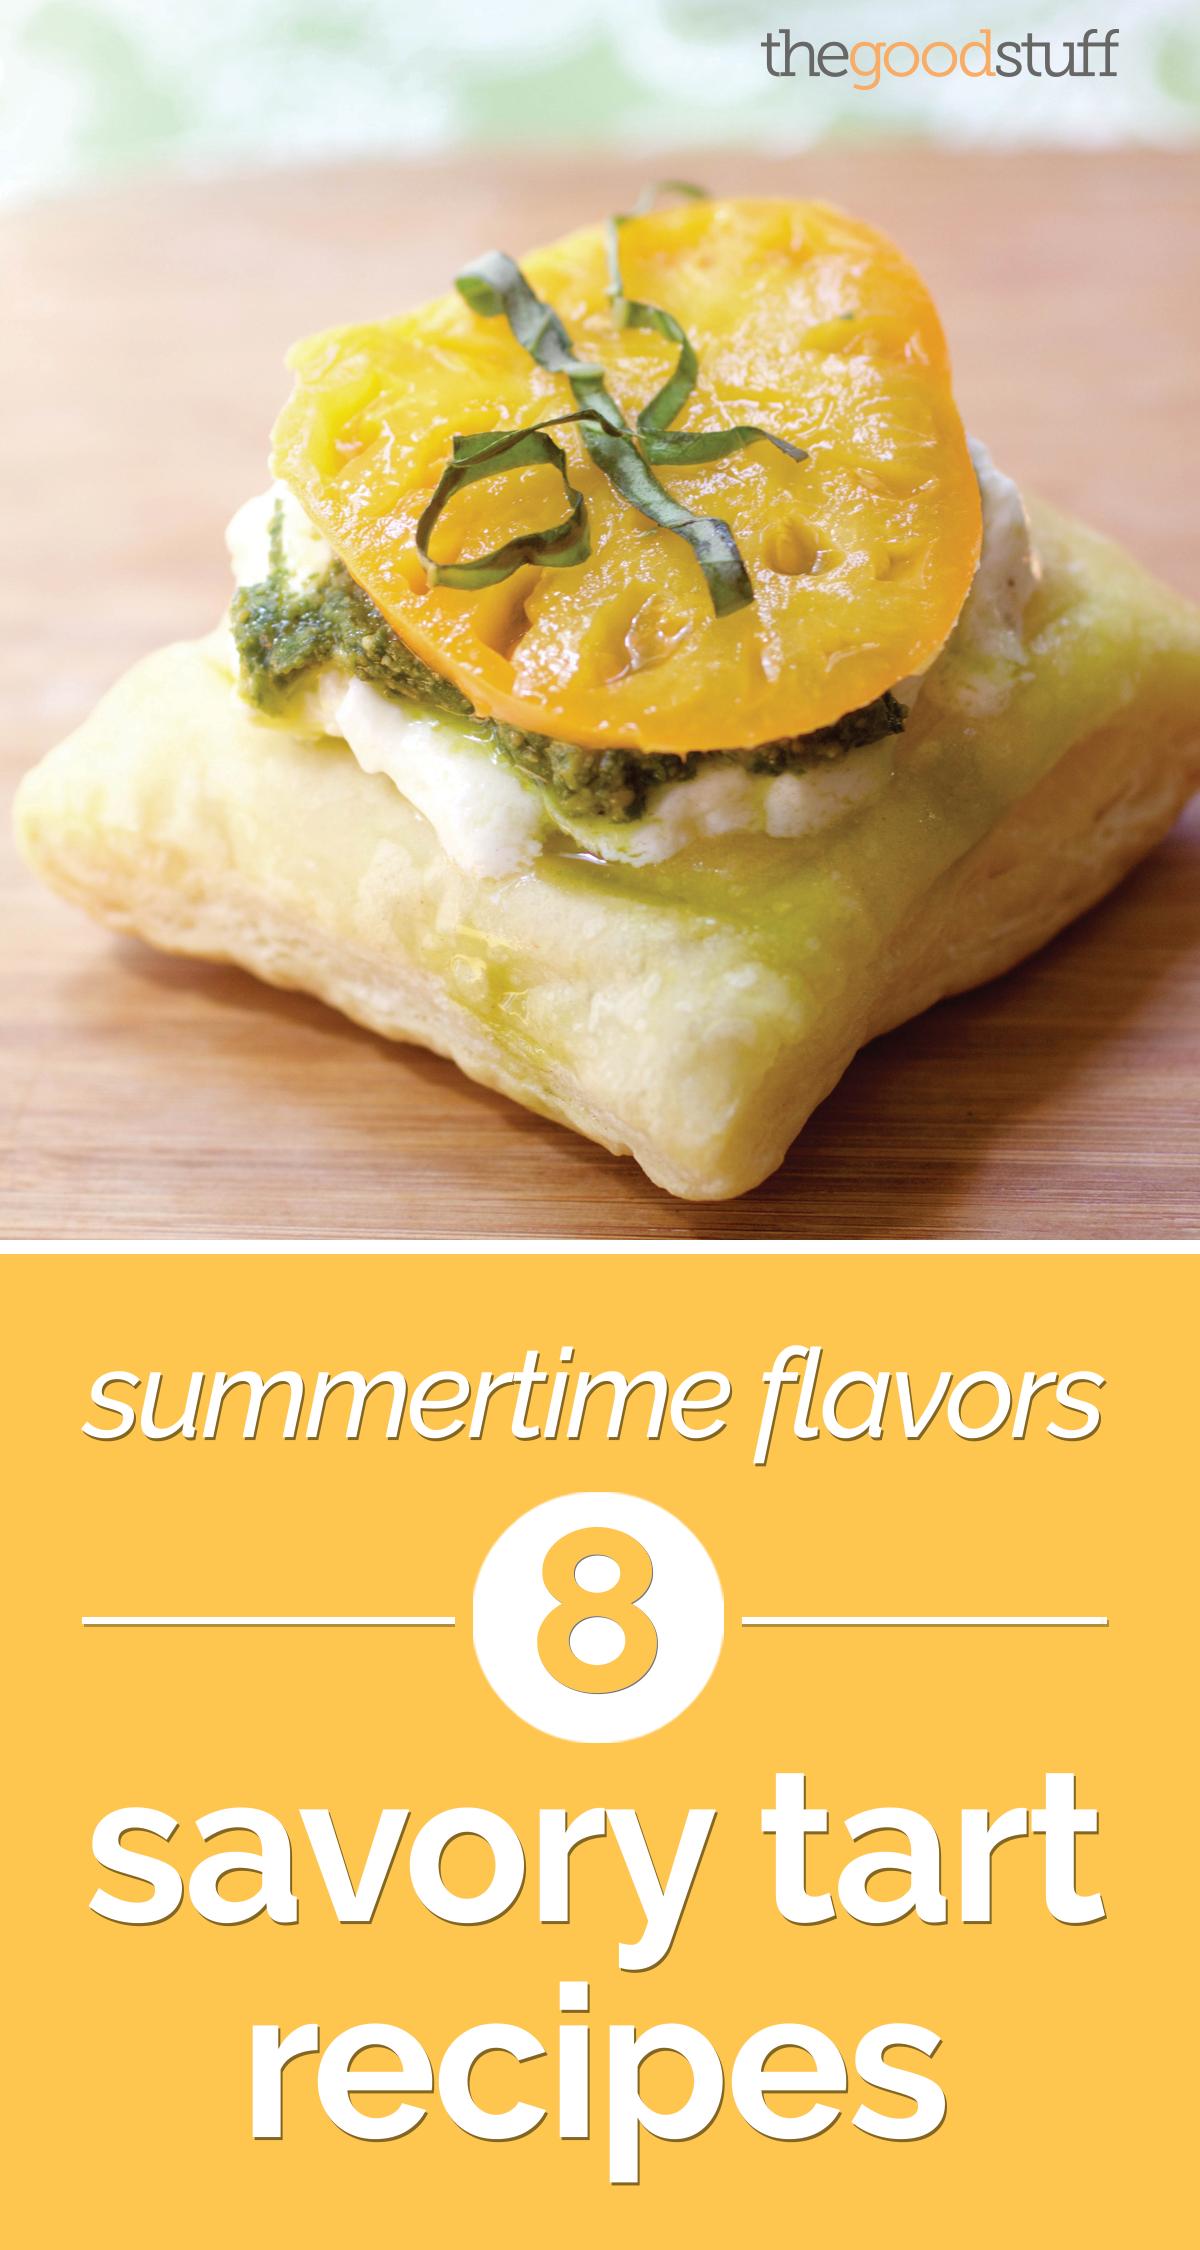 Summertime Flavors: 8 Savory Tart Recipes | thegoodstuff